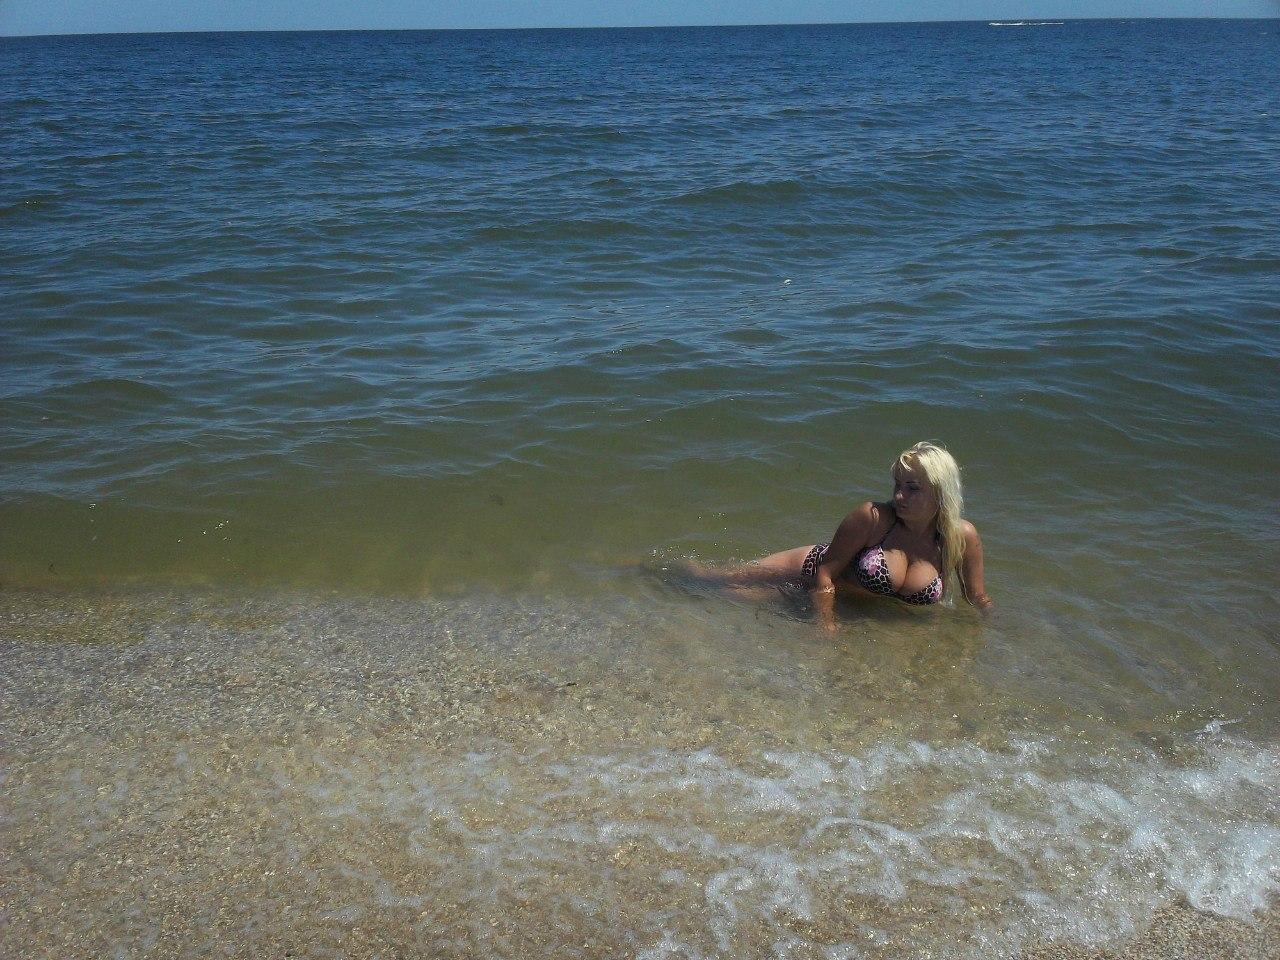 Азовское море. Бердянск. 2012 г. D9gmHIM_v0s